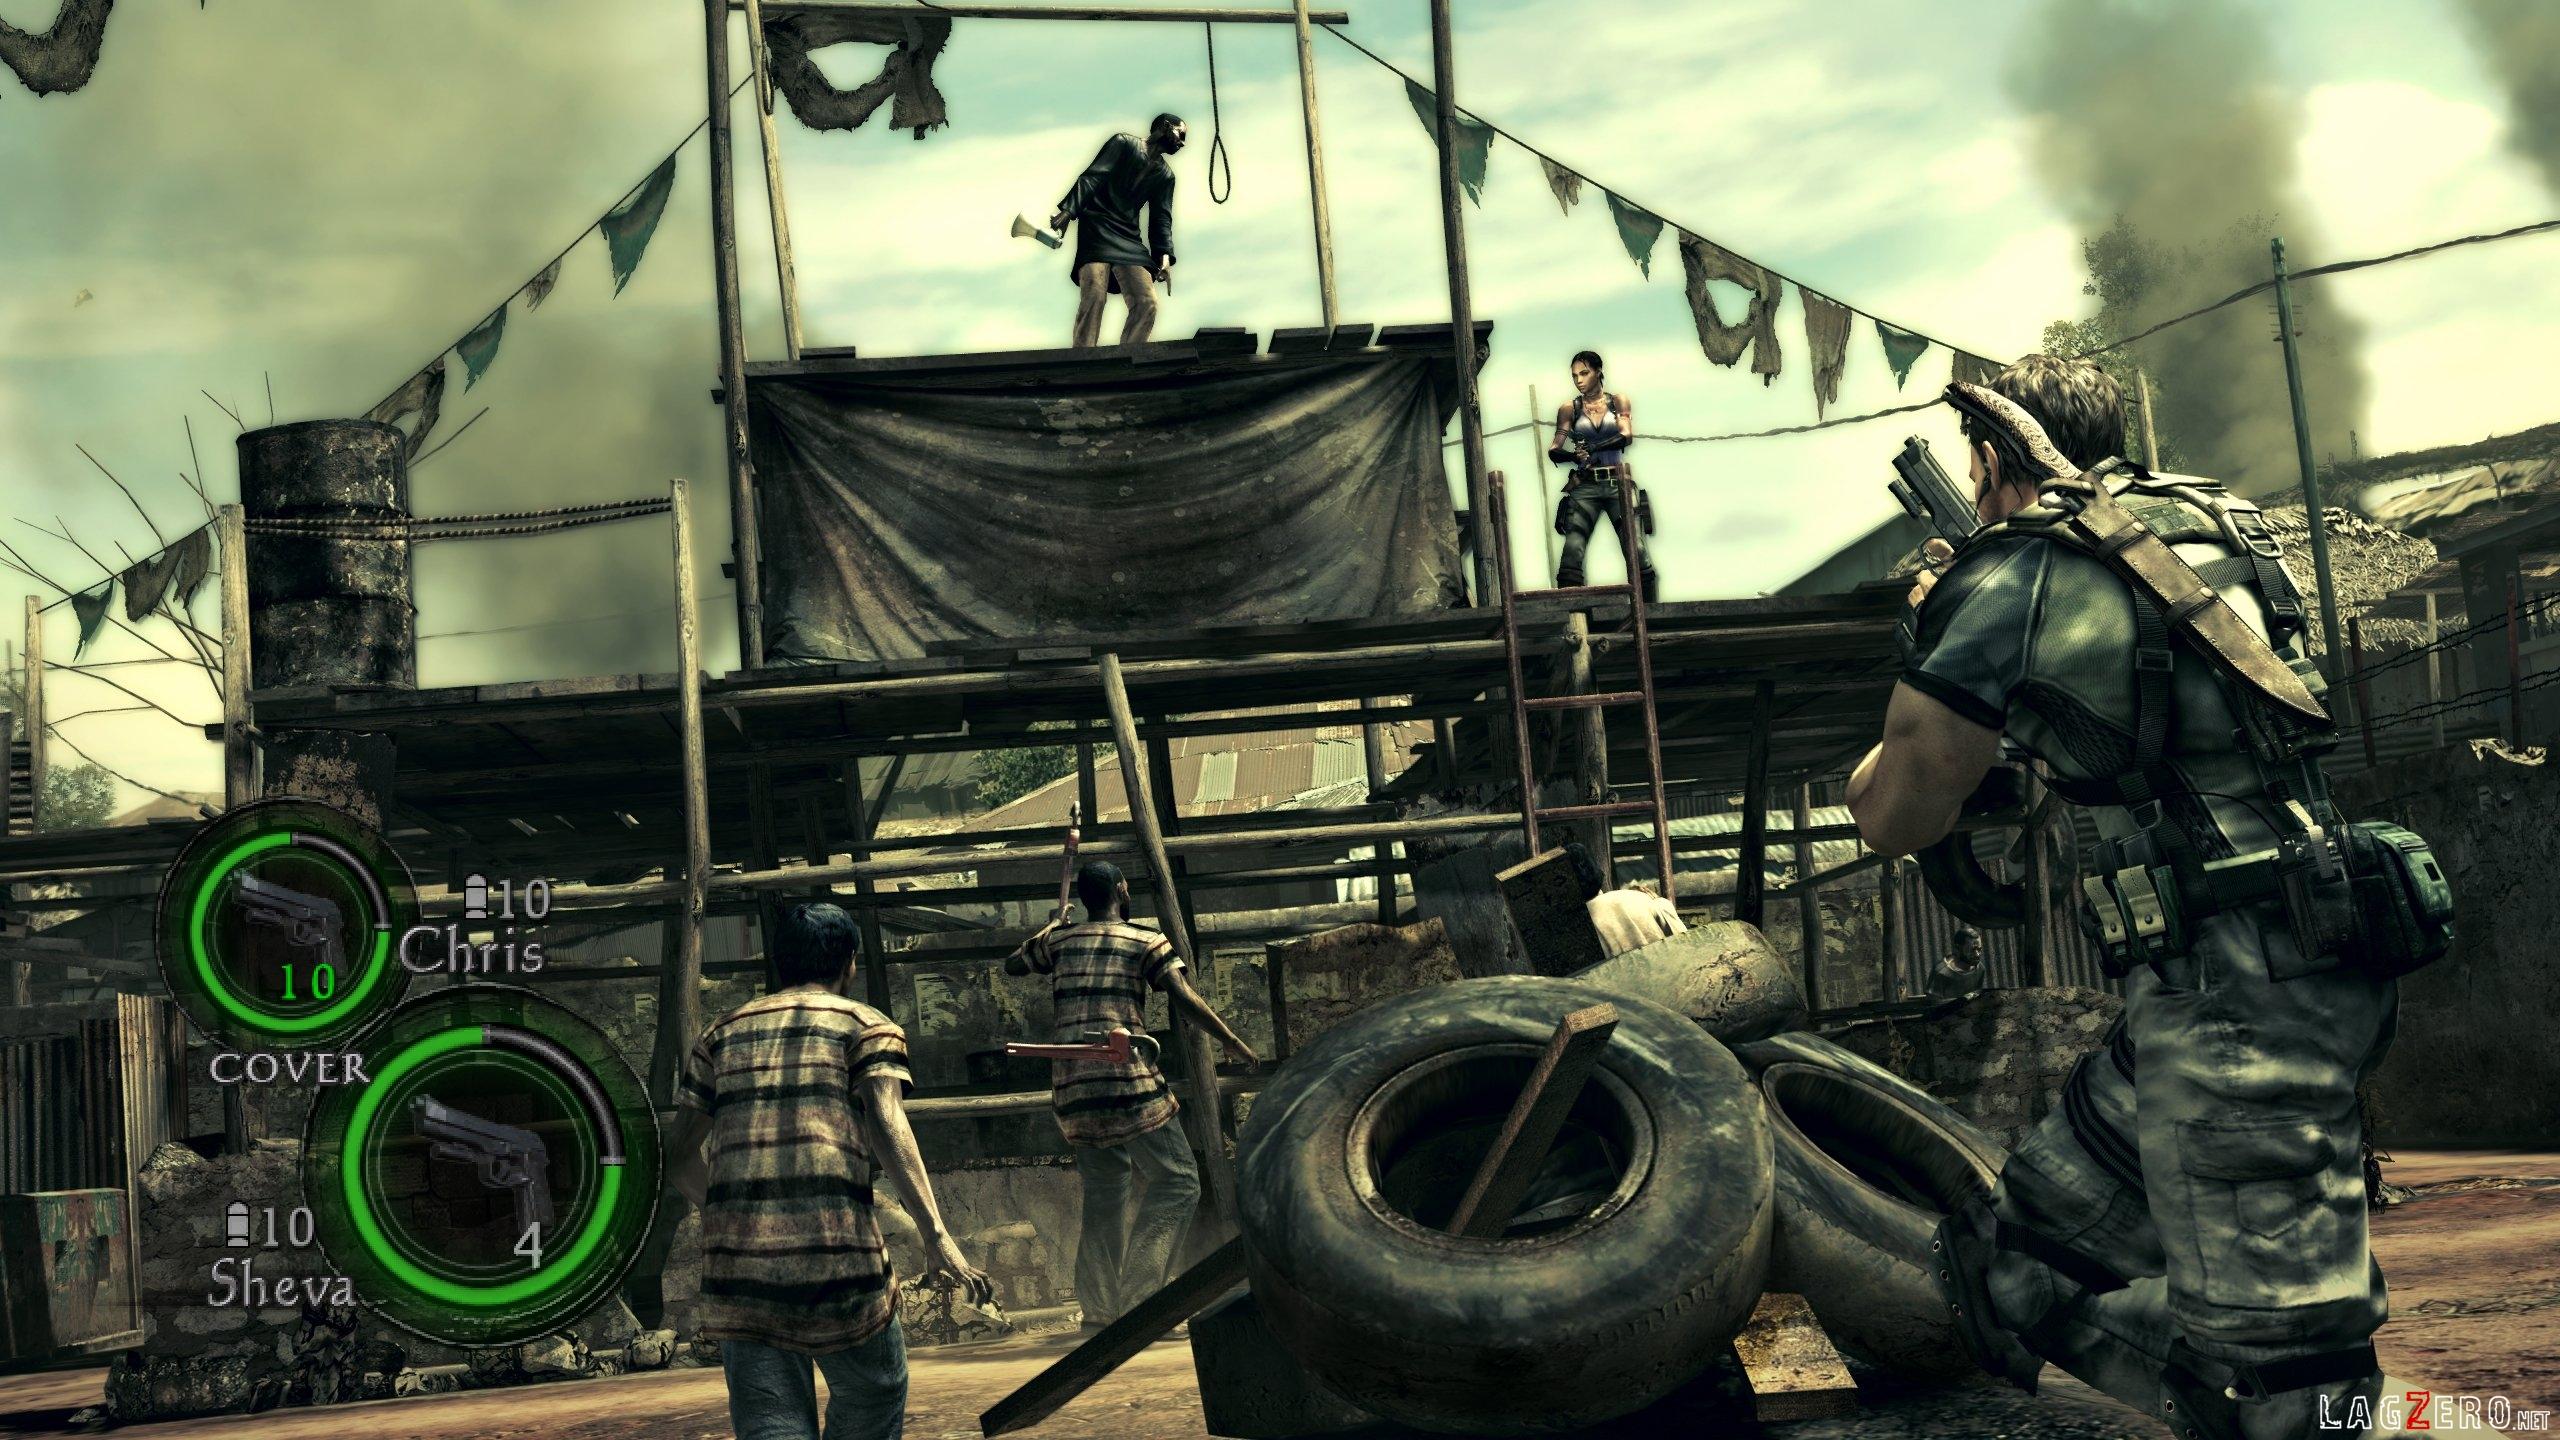 Screenshots Del Juego Cooperativo En Resident Evil 5 Lagzero Net